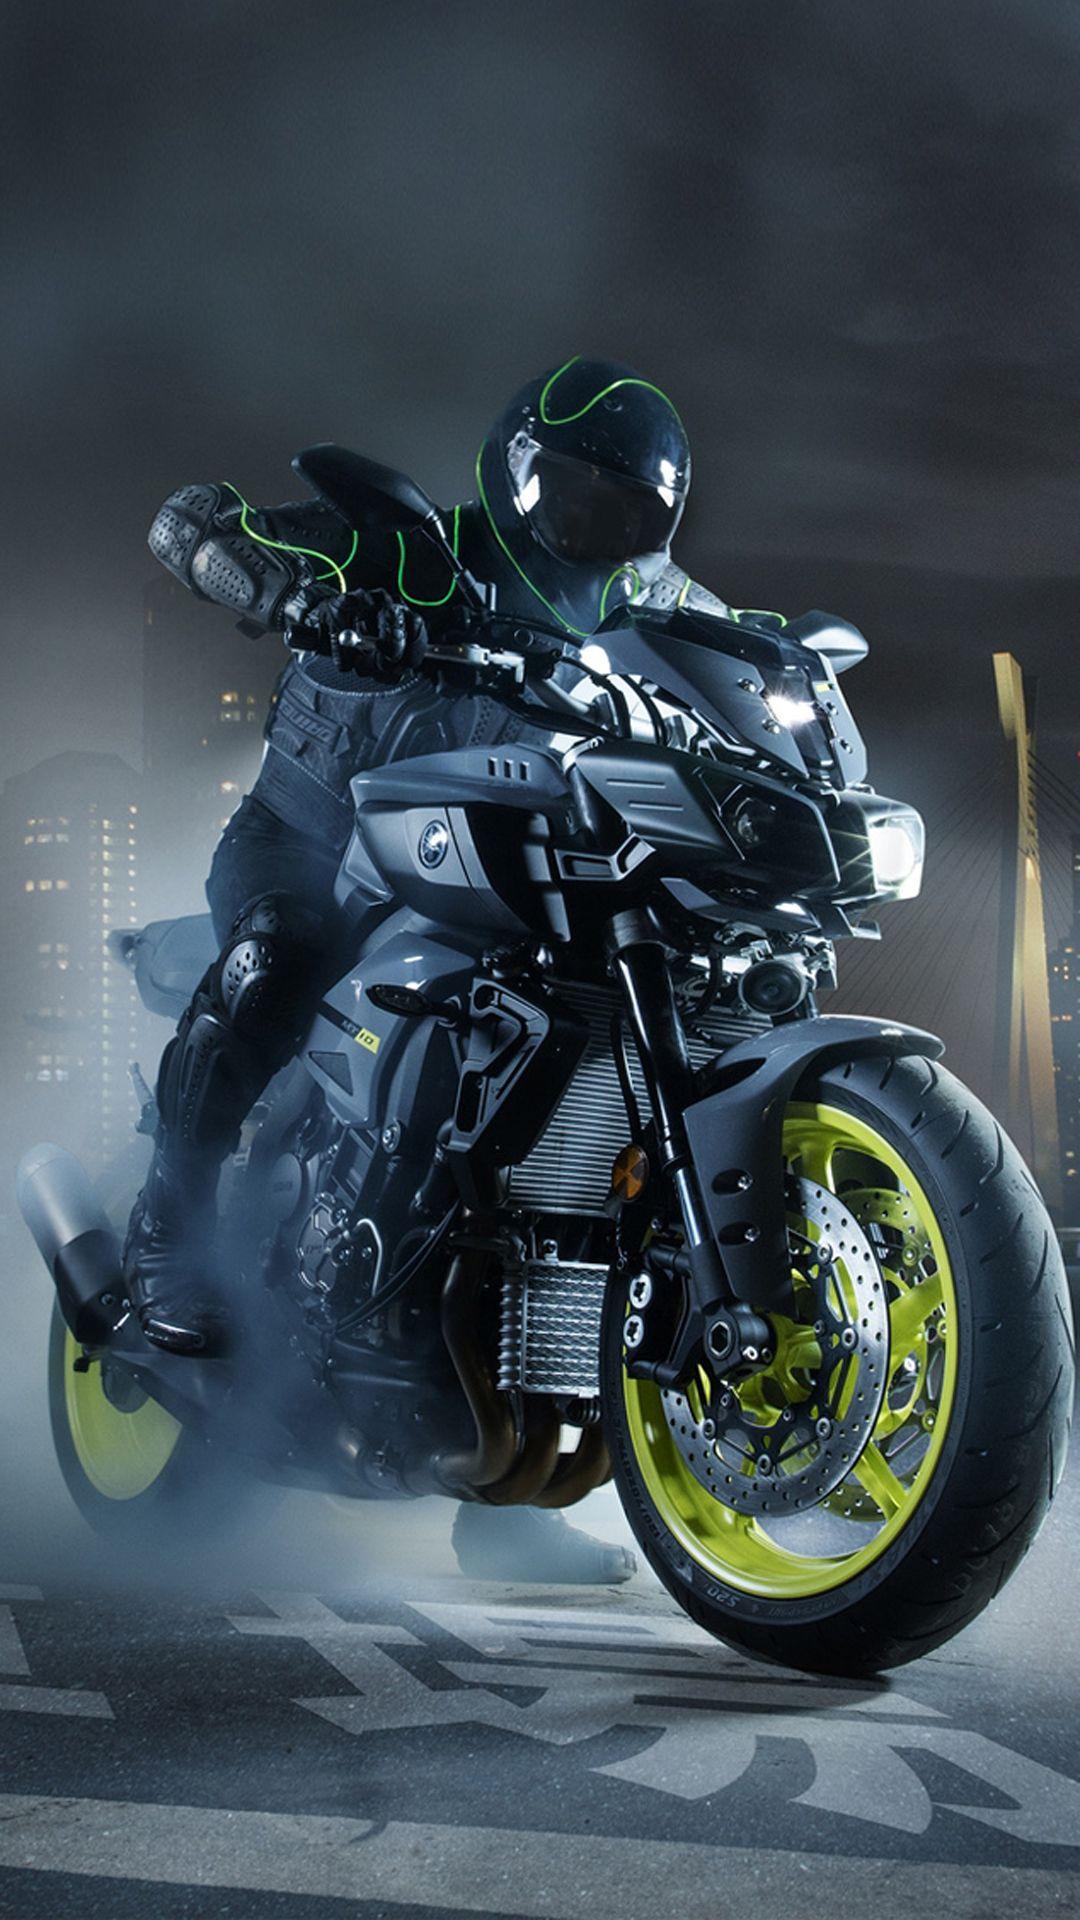 Yamaha MT 10 Bike Mobile HD Wallpaper in 2020 Motorcycle